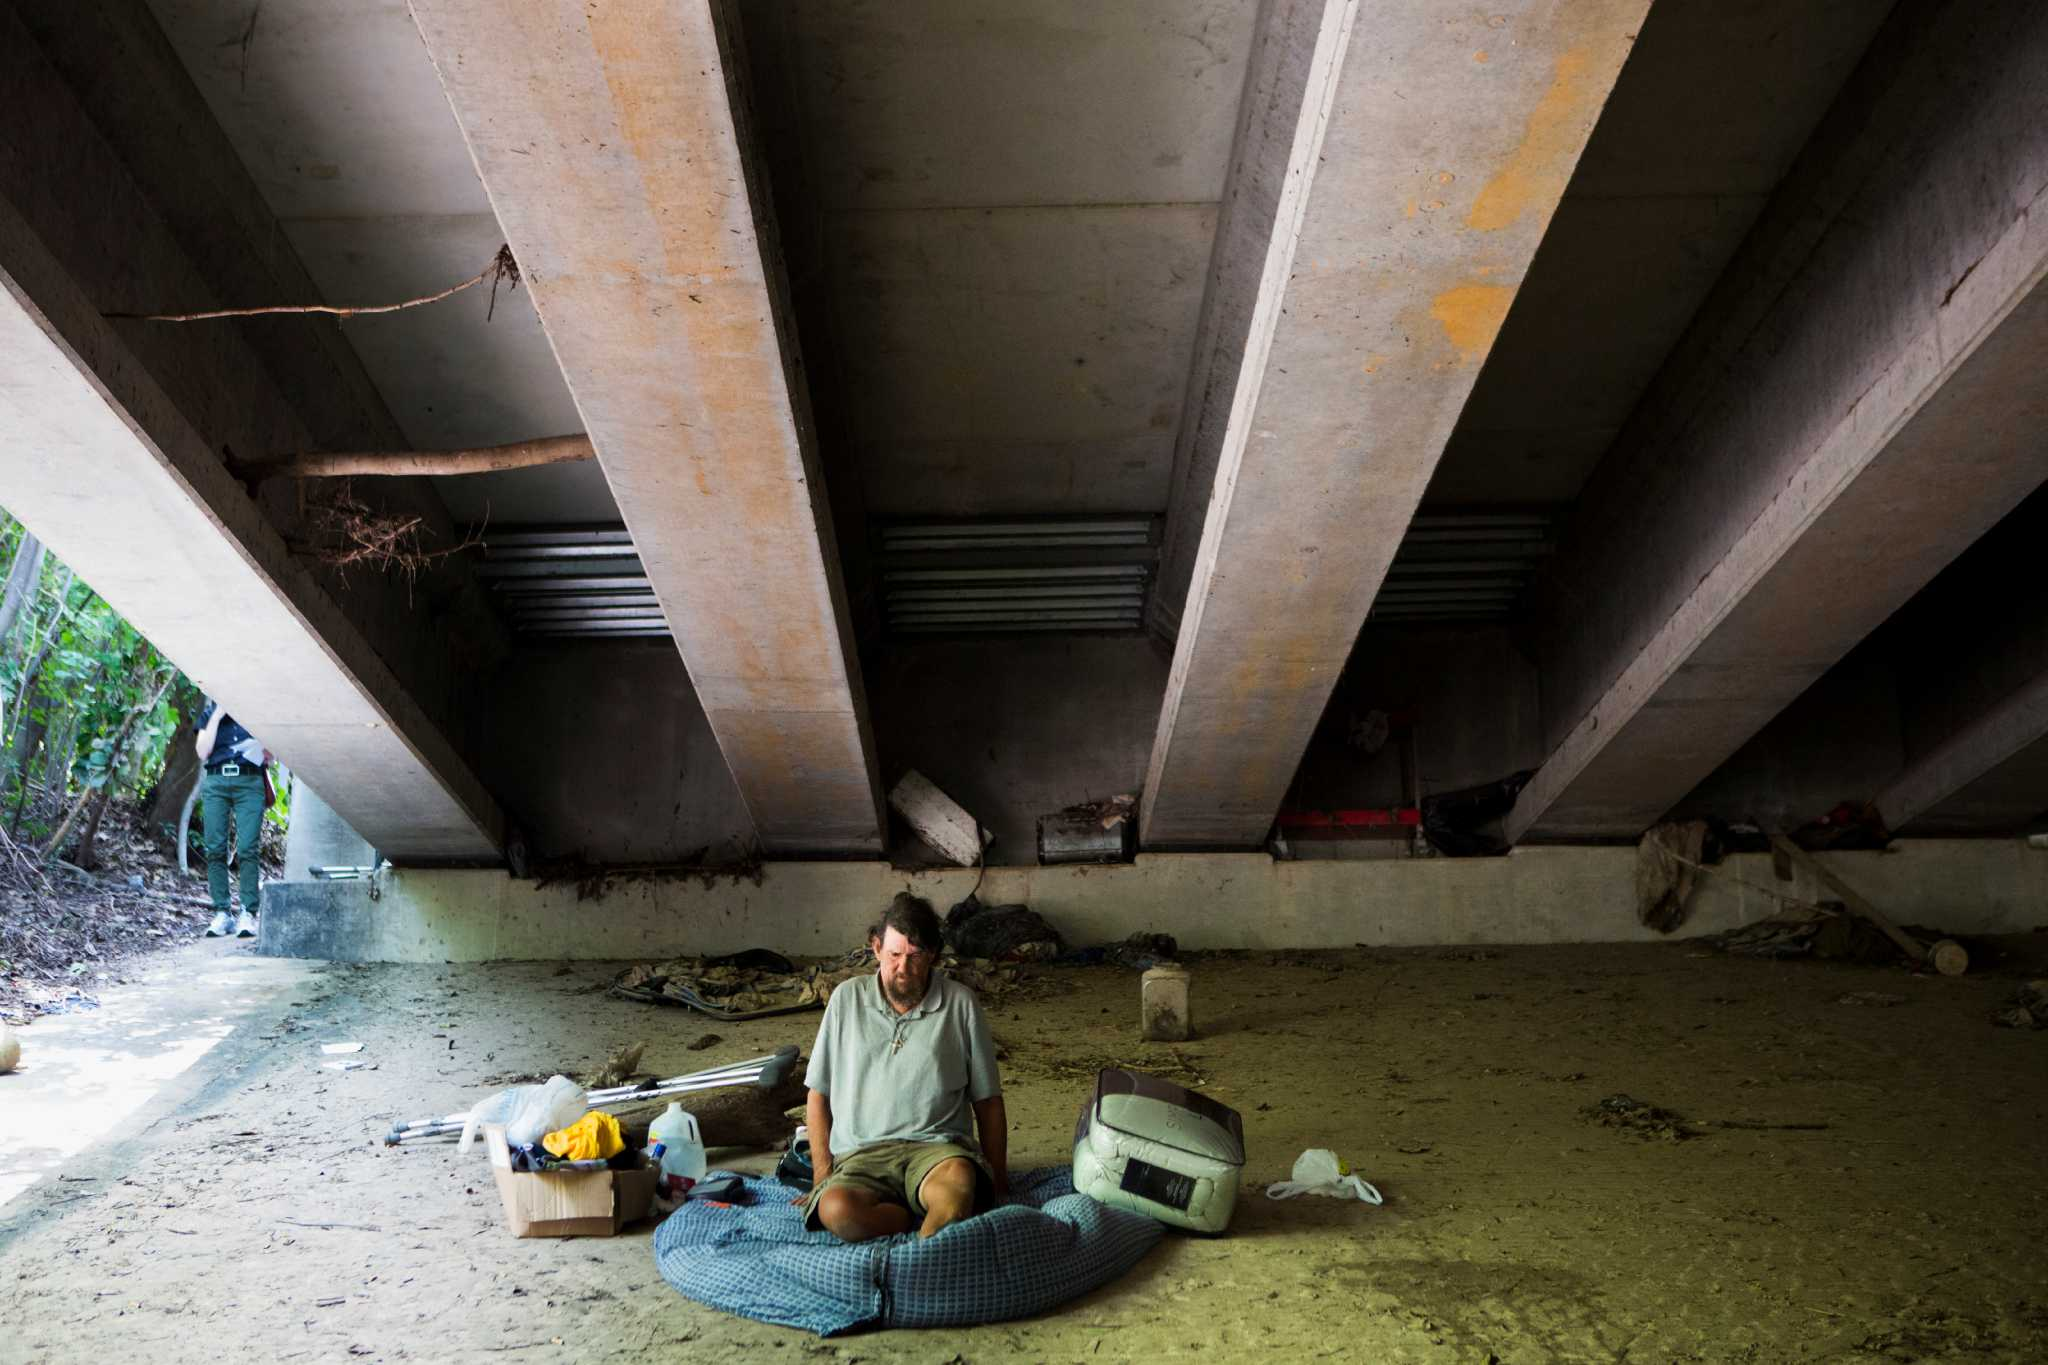 Houston-area Homelessness Down Slightly, Especially In Key